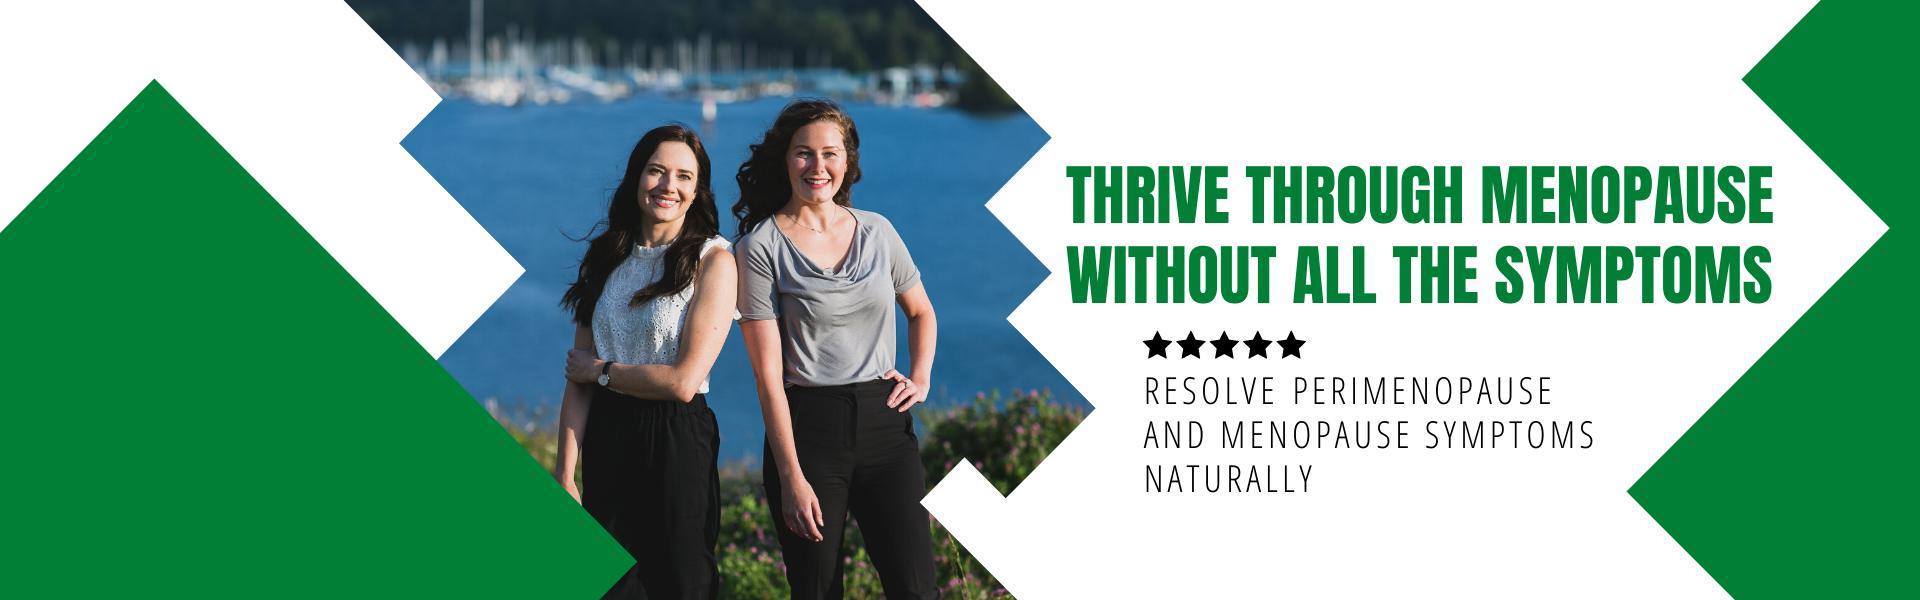 Thrive through menopause